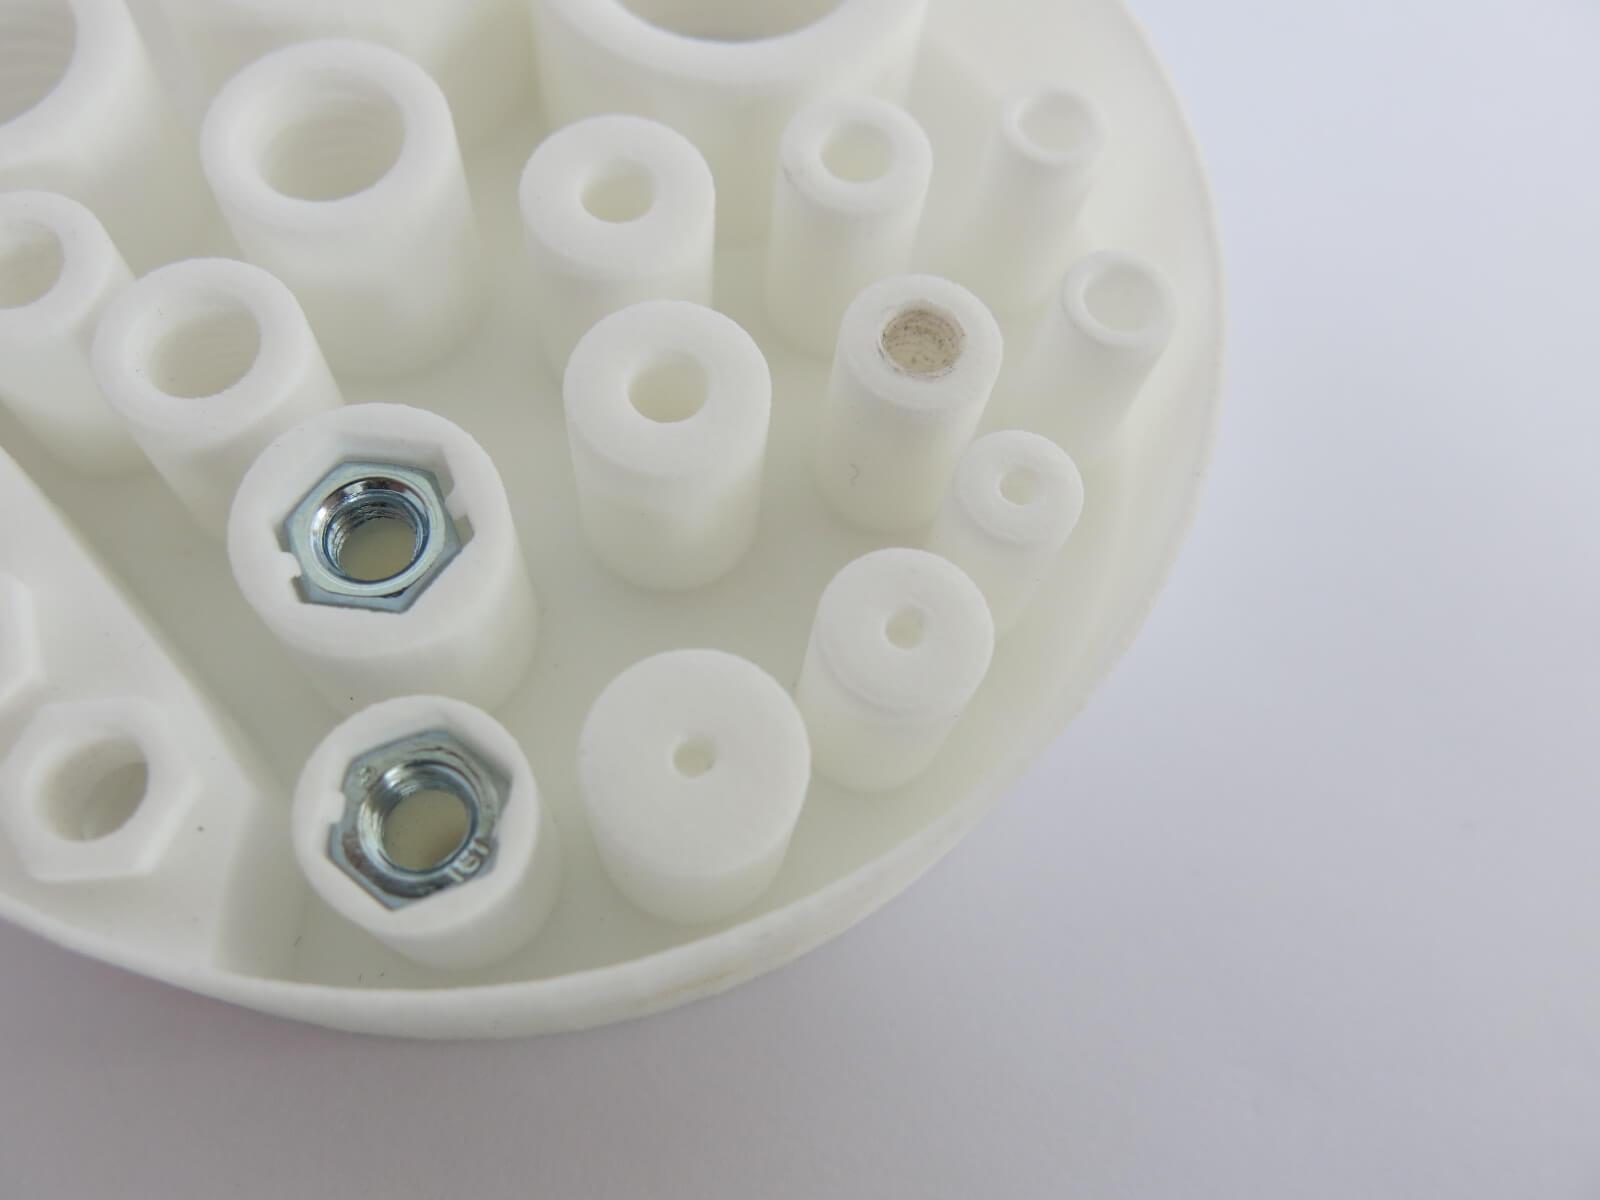 3d printed screws